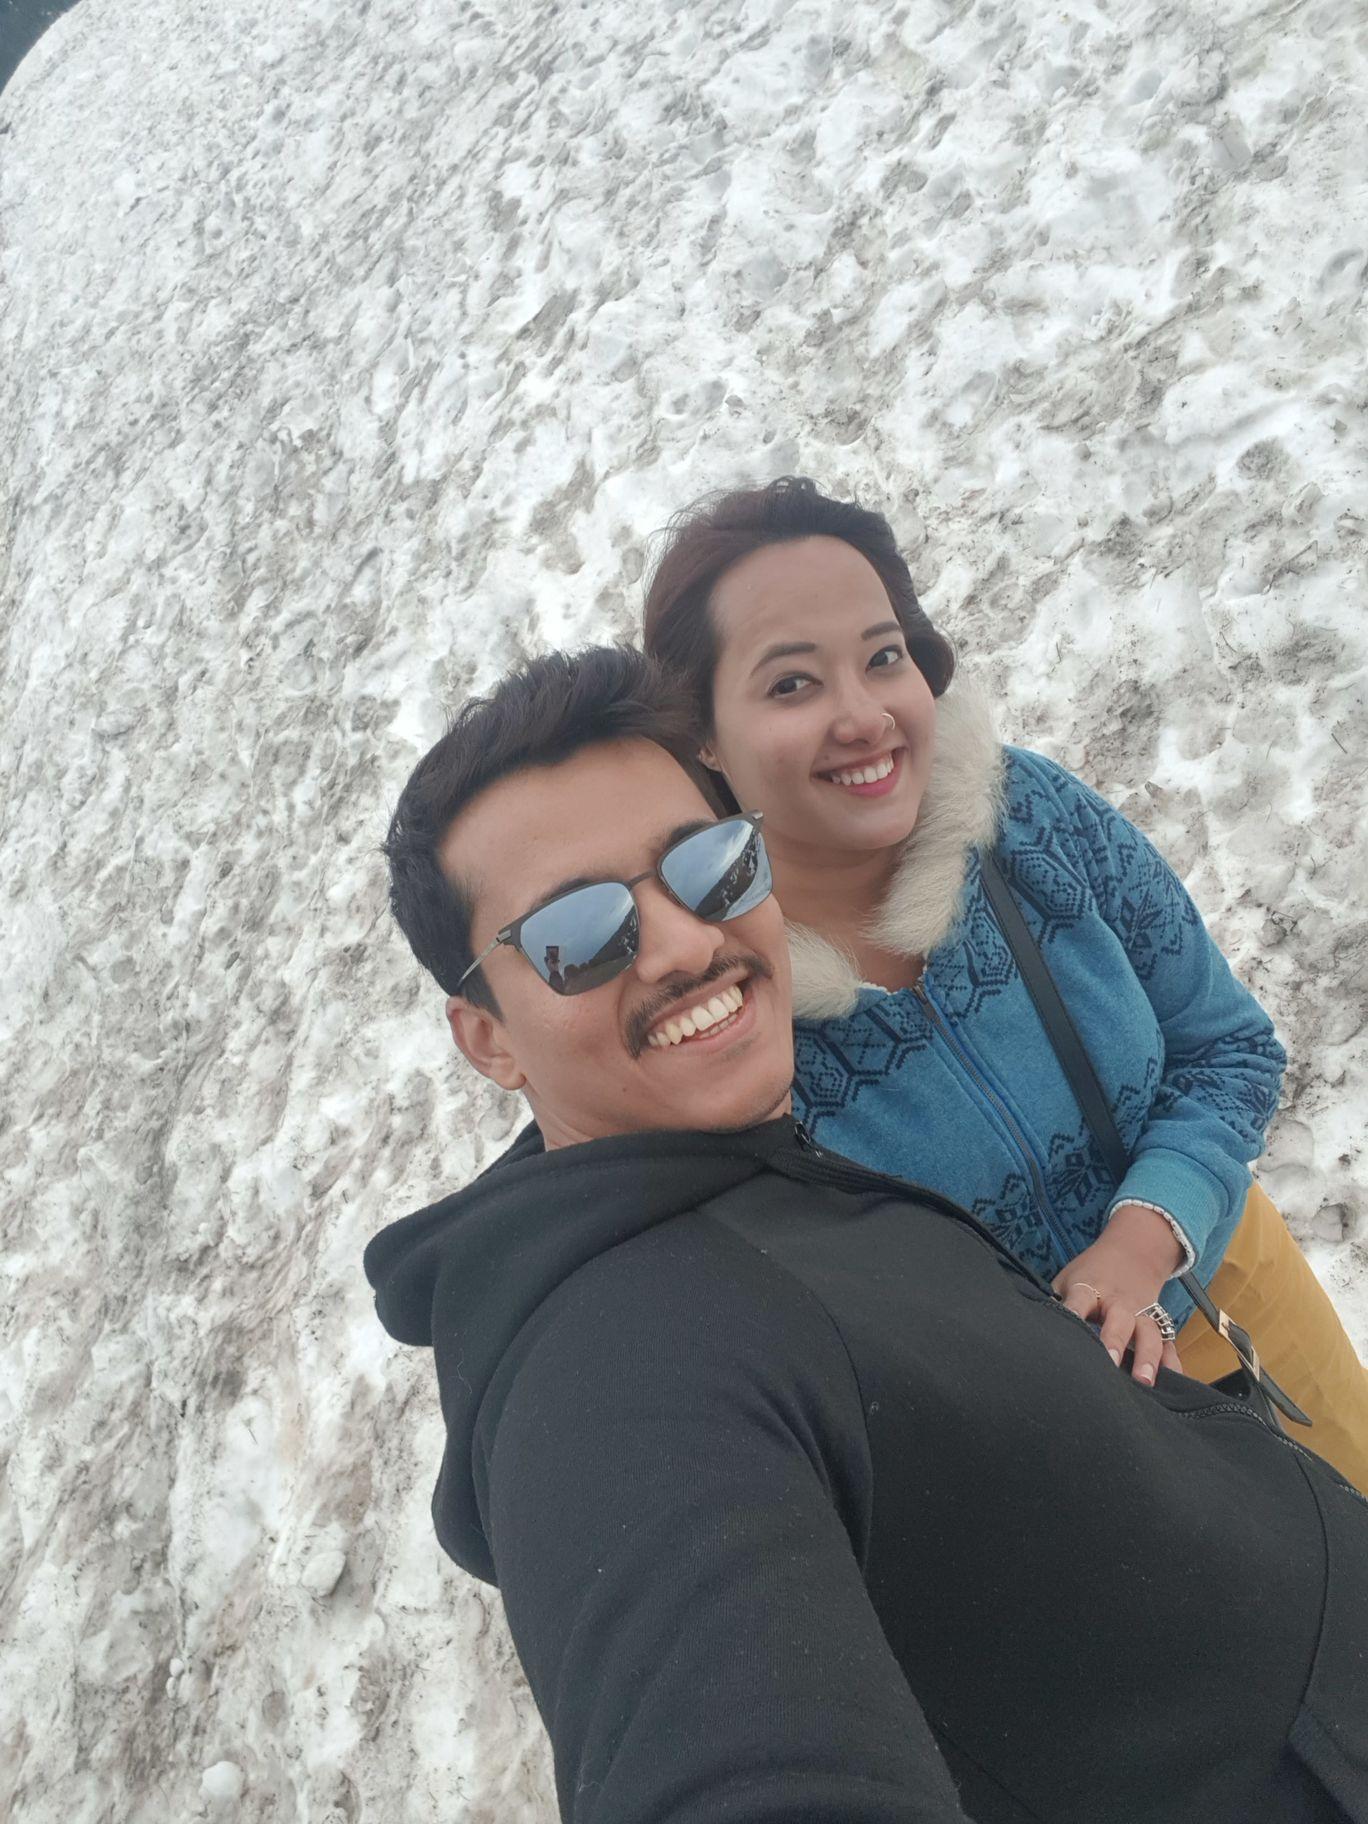 Photo of Dainkund Peak By Anuradha Barge